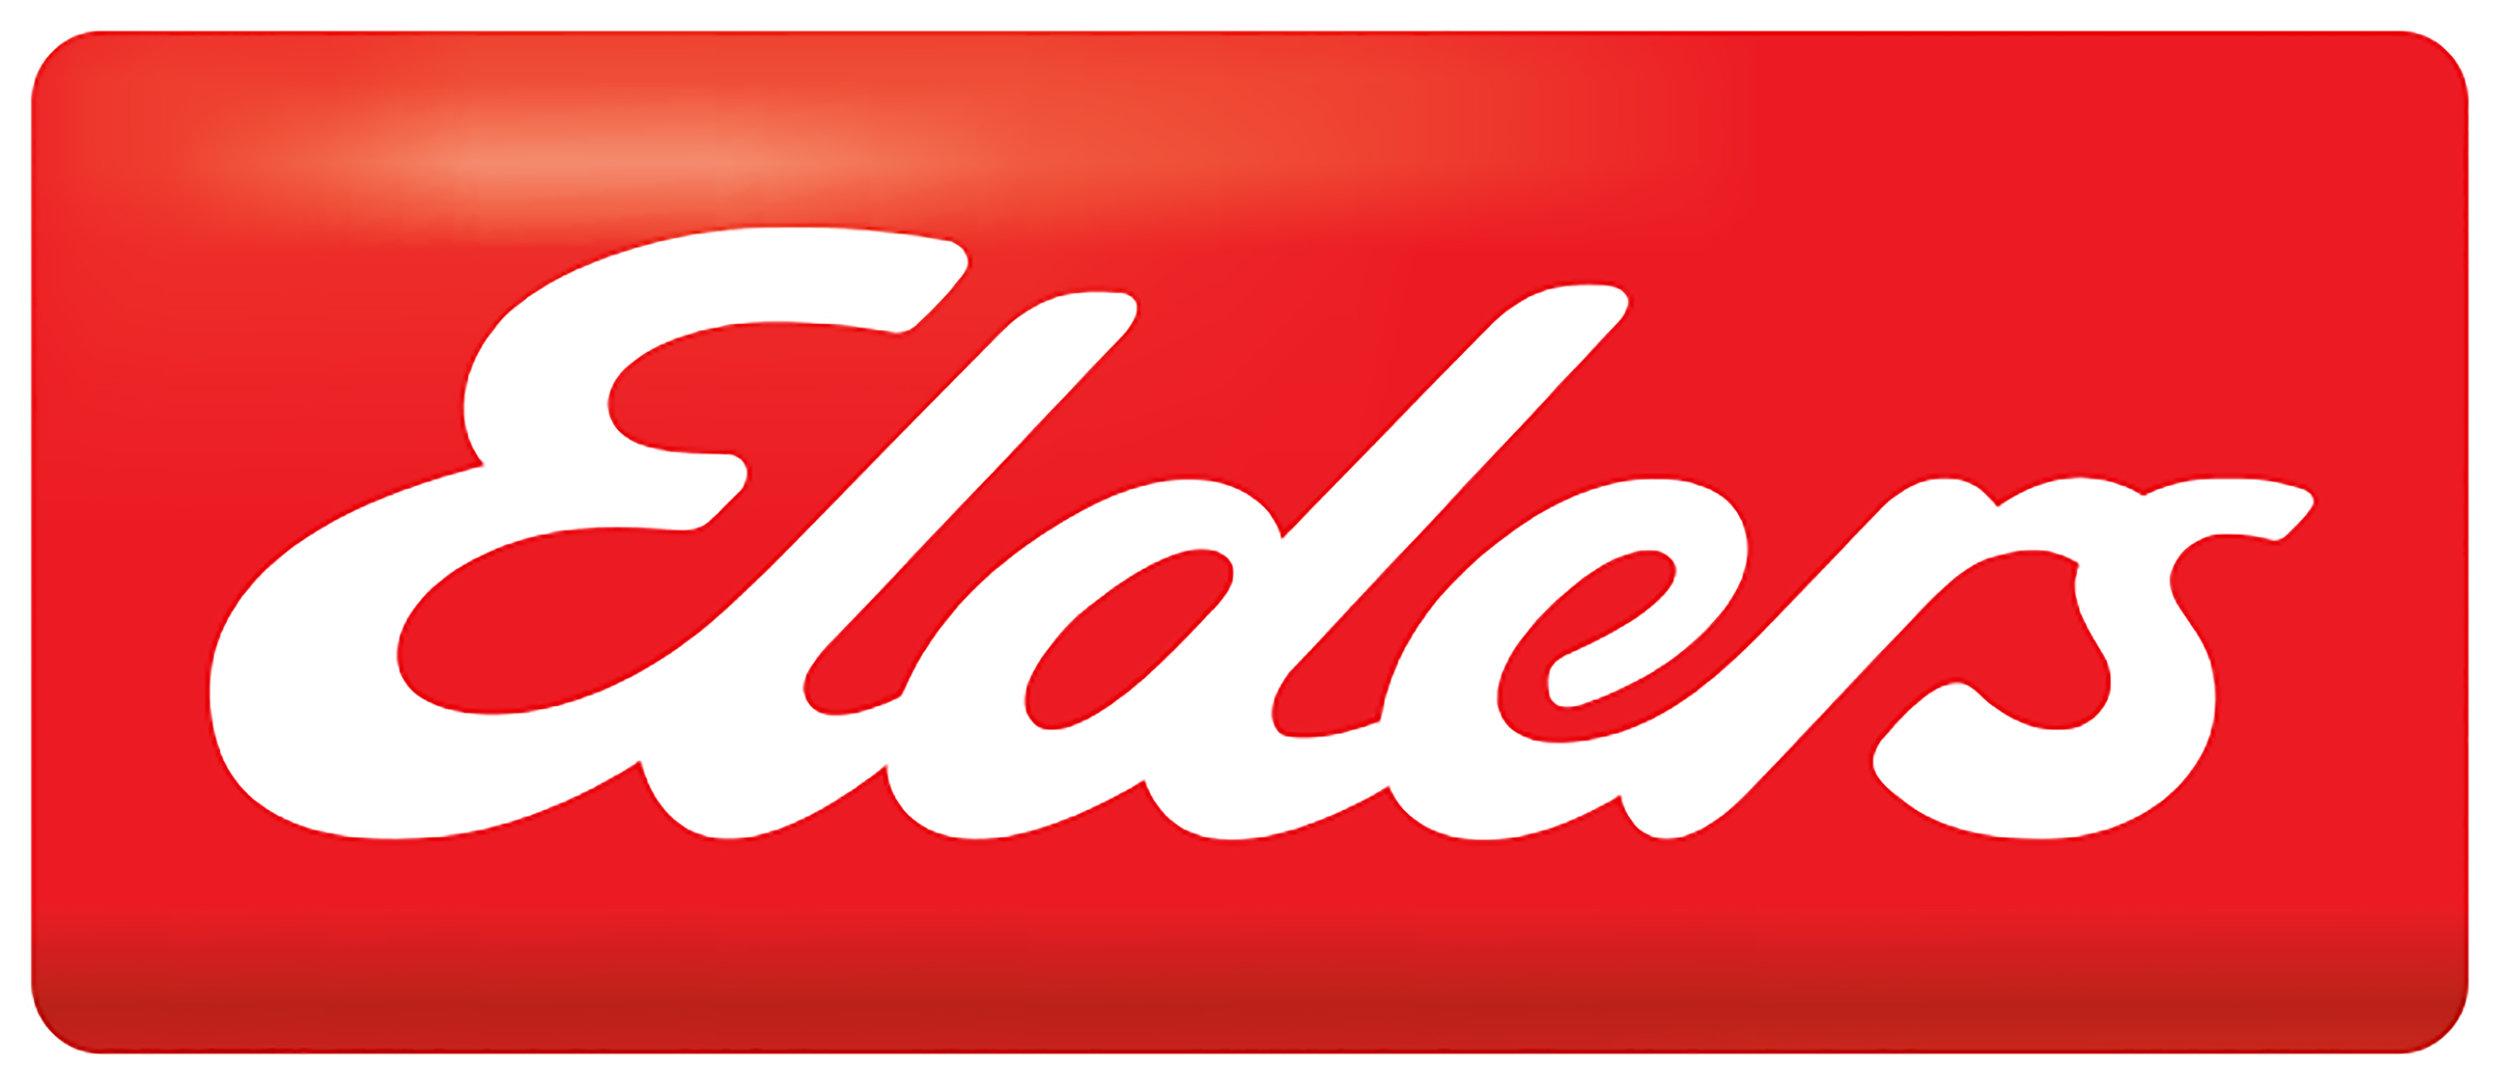 Elders-Logo-4-colour-stand-alone-high-res.jpg